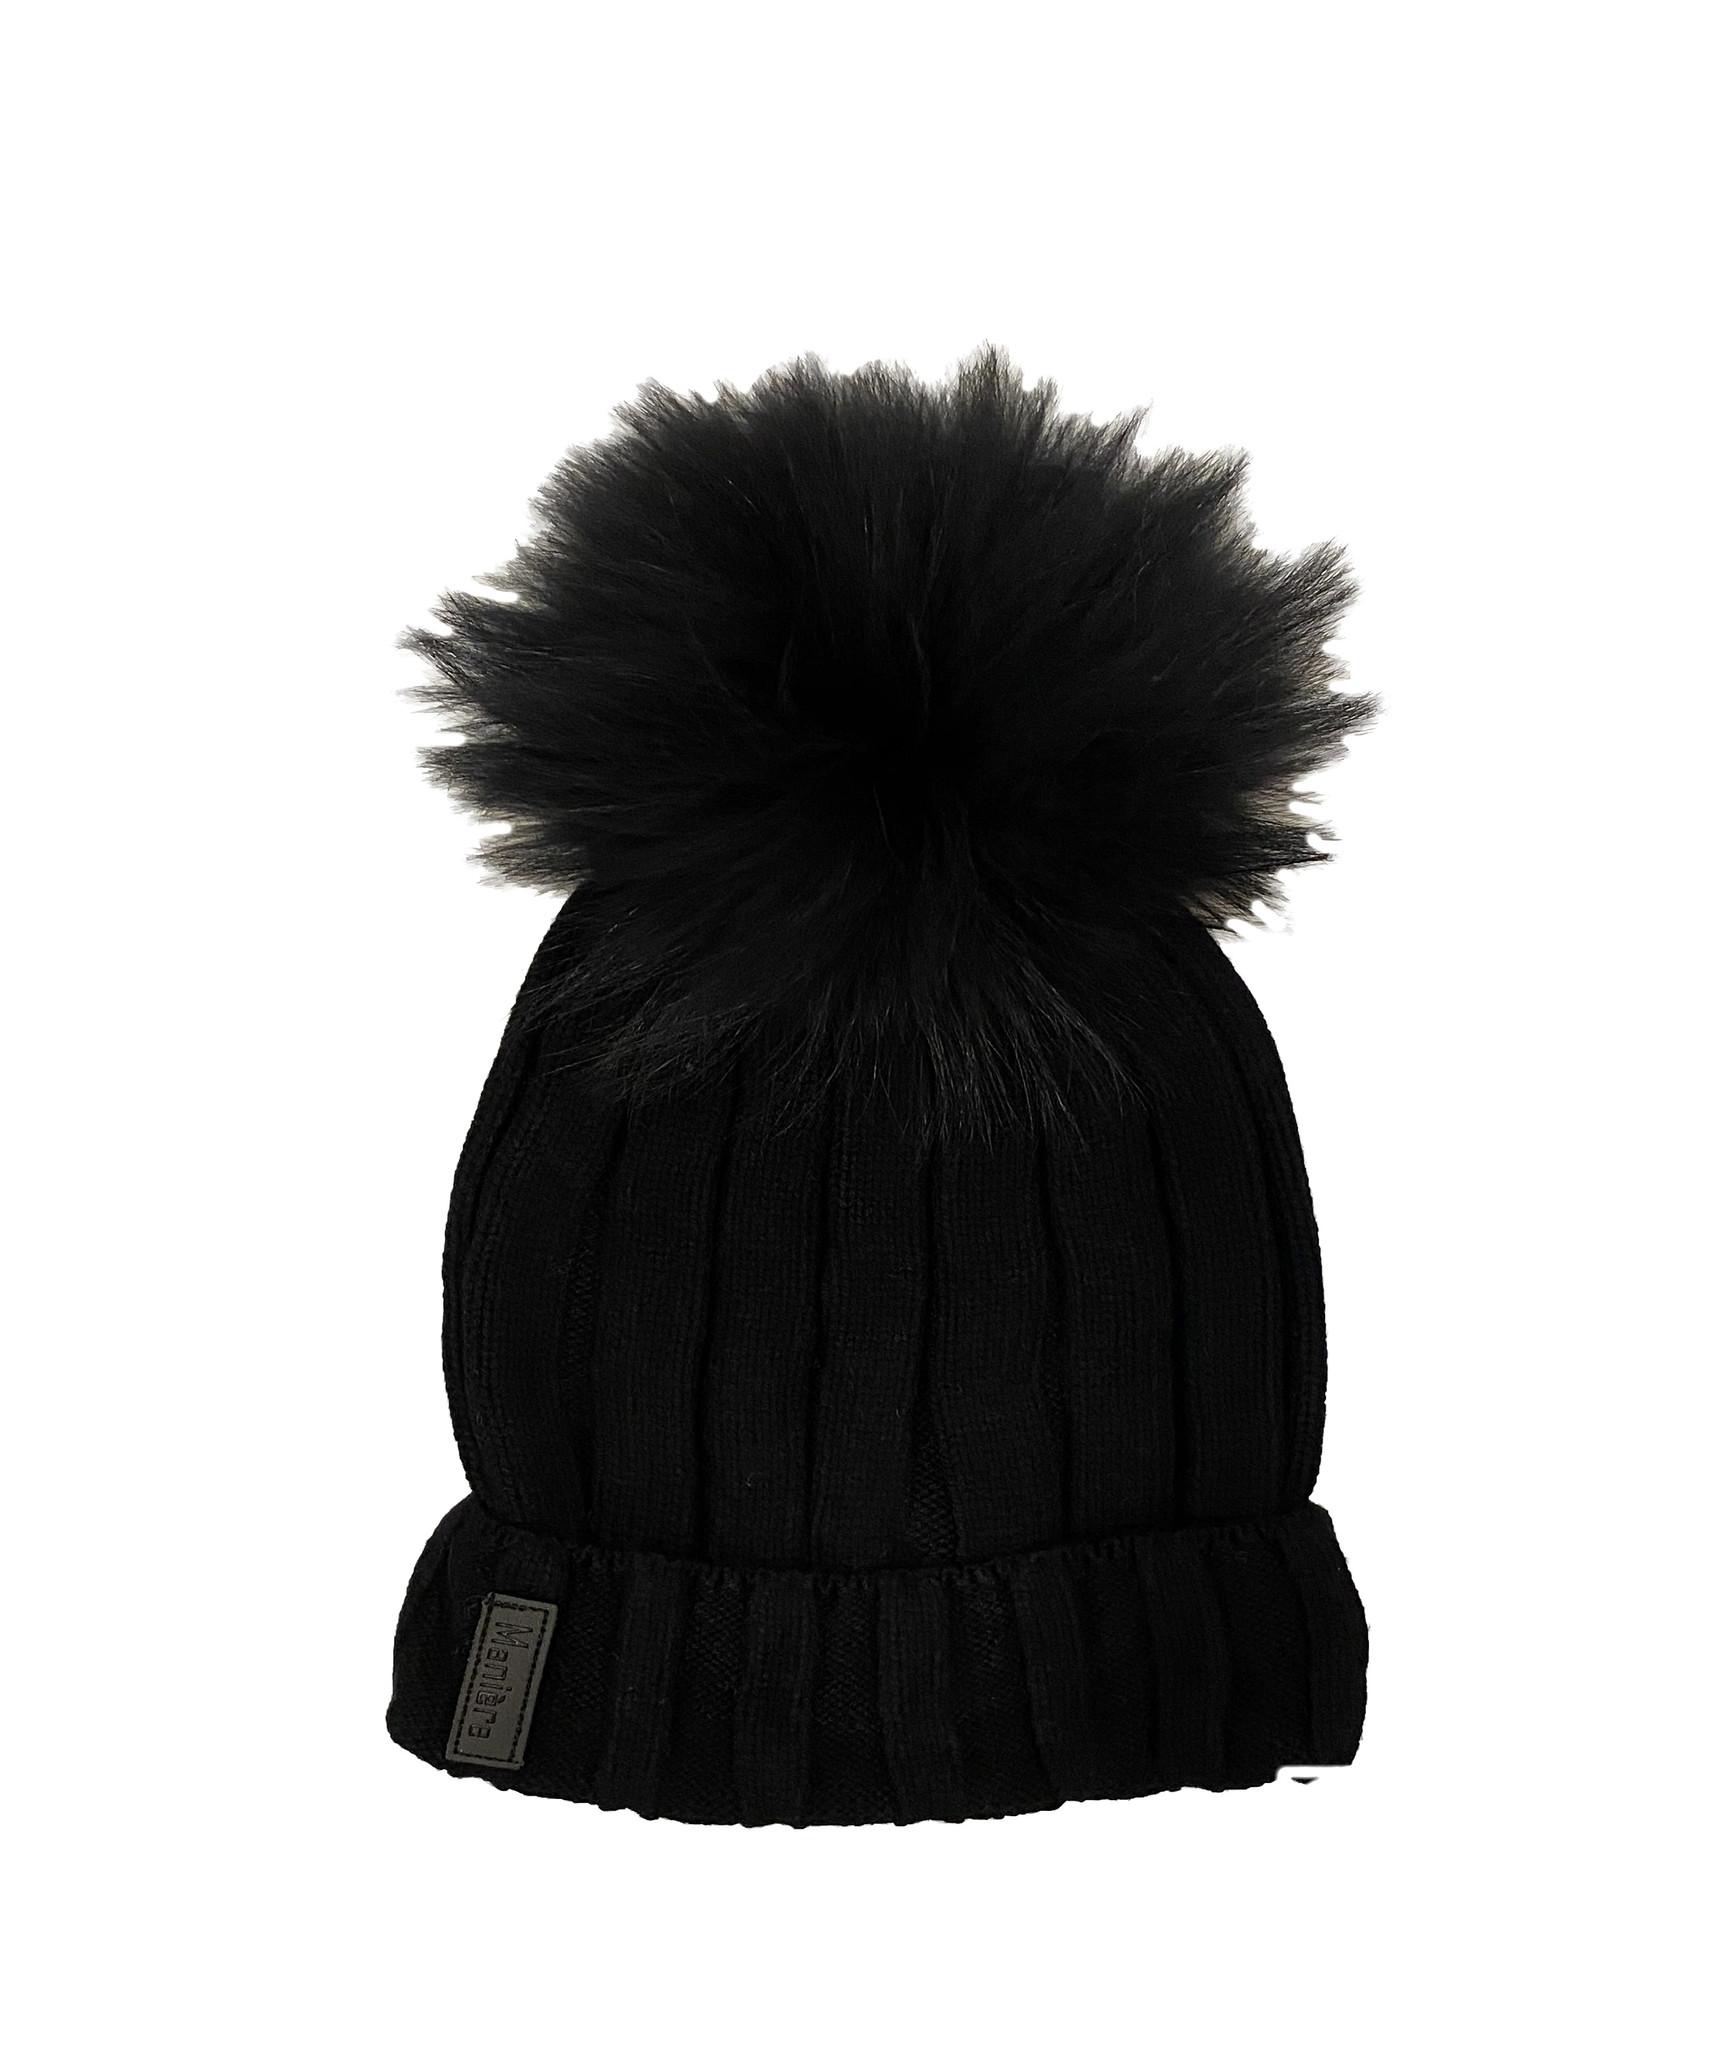 Black Ribbed Pom Pom Hat - Adult